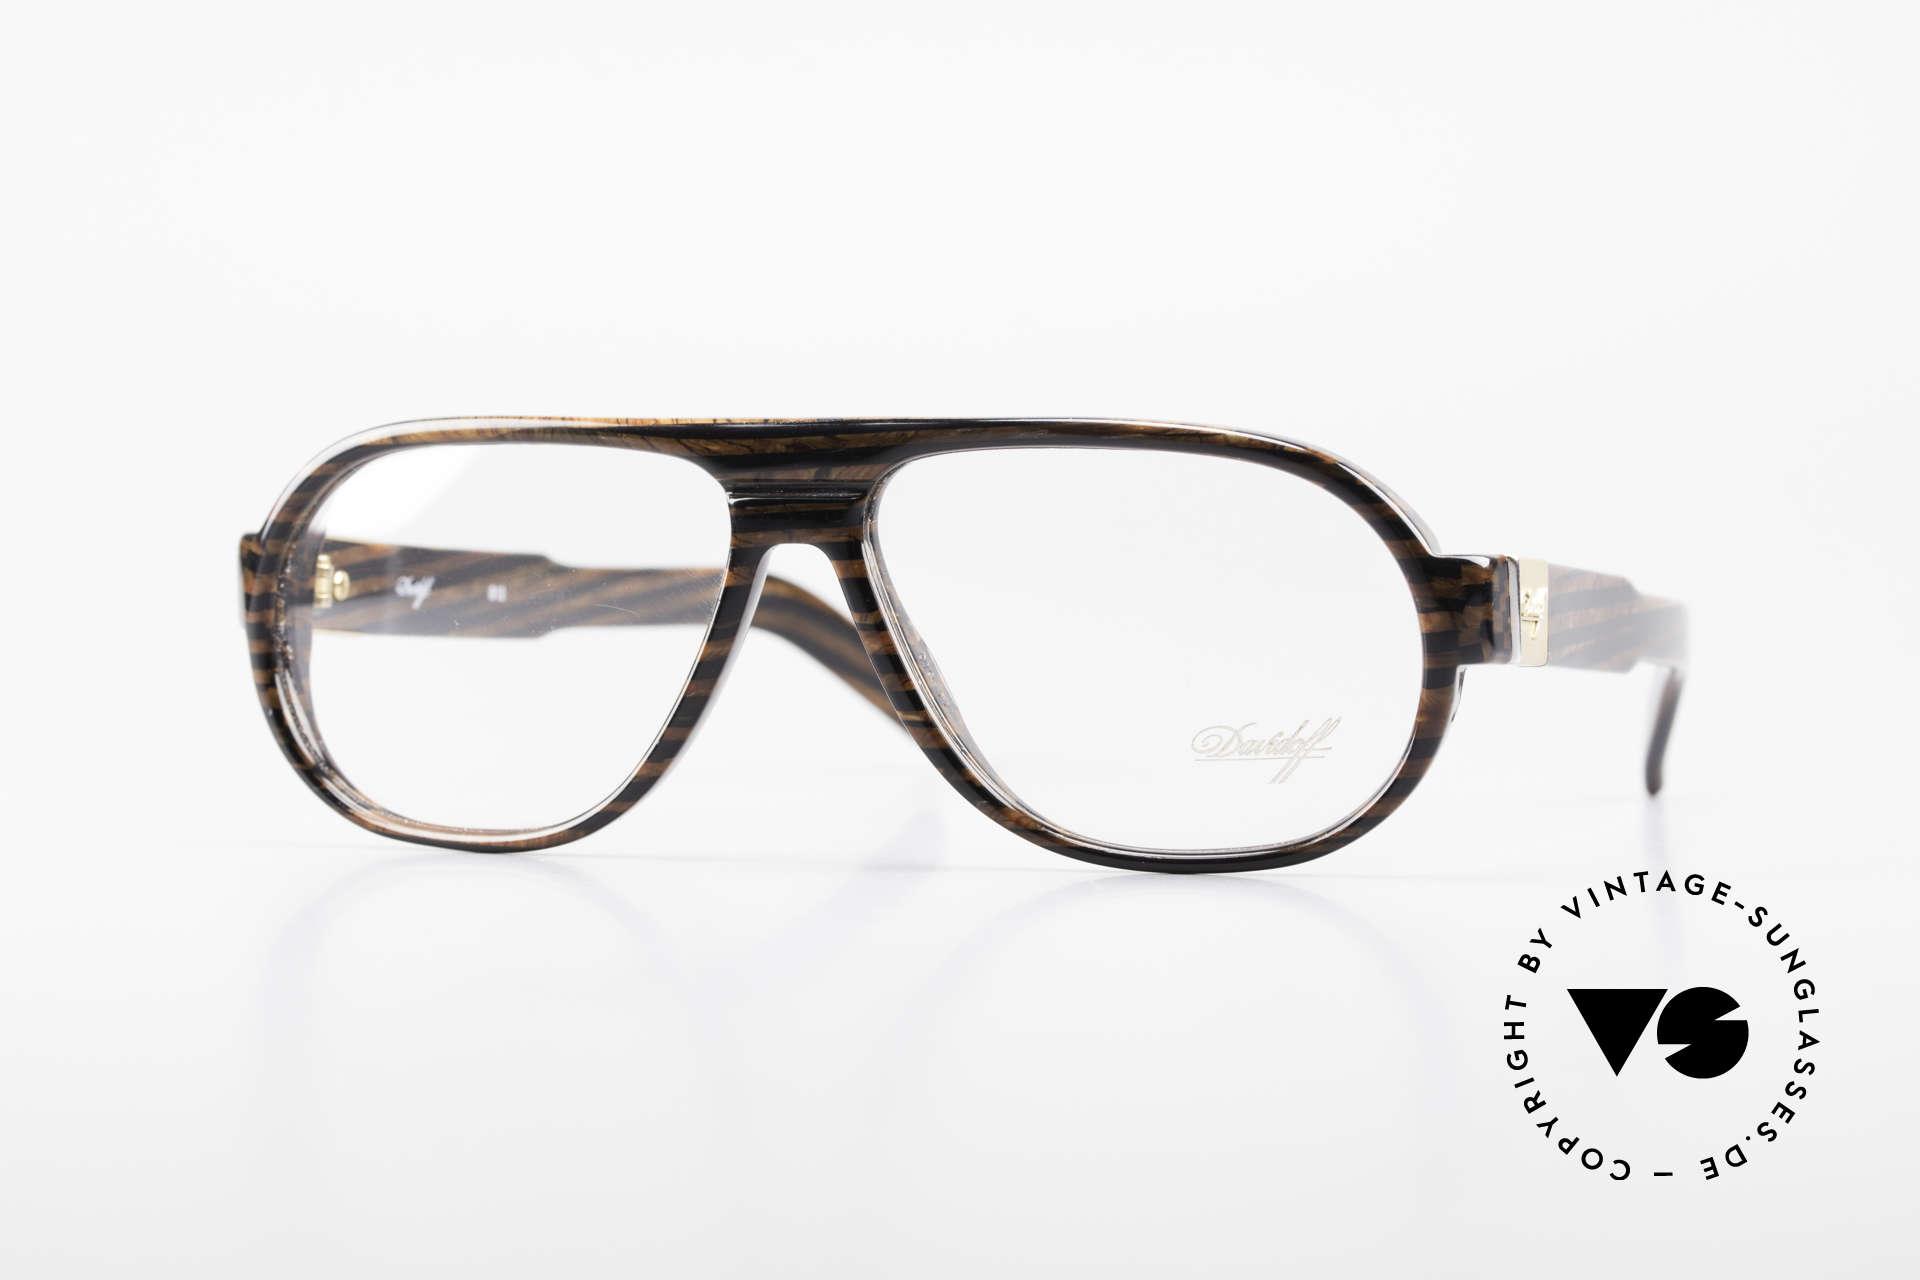 Davidoff 100 90's Men's Vintage Glasses, rare and very elegant eyeglasses-frame by DAVIDOFF, Made for Men